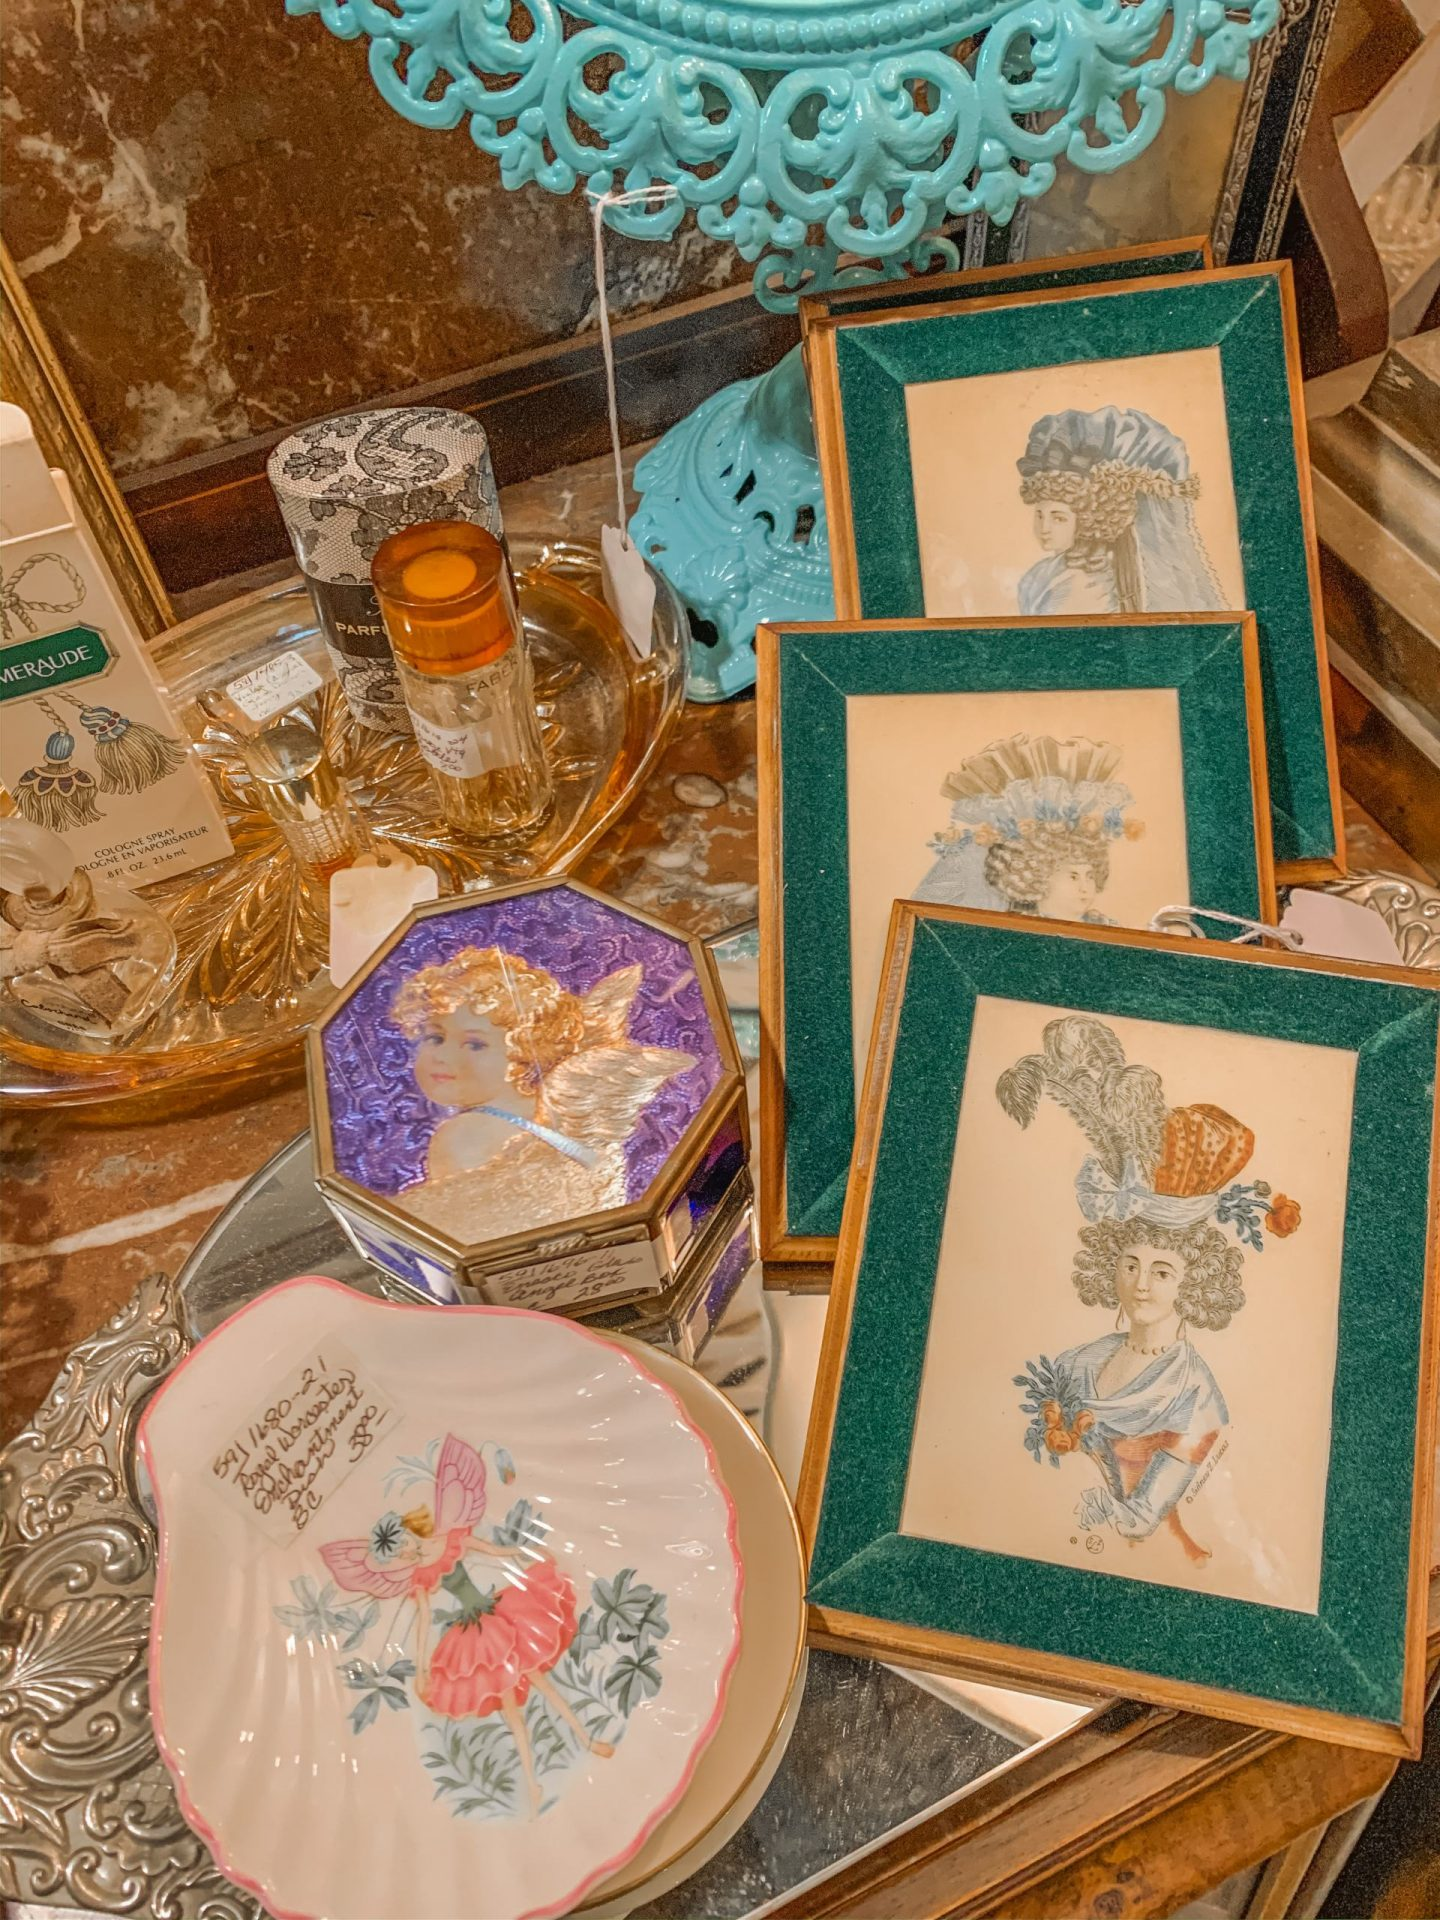 Bijuleni | Amelia Island Travel Guide - Antique Stores